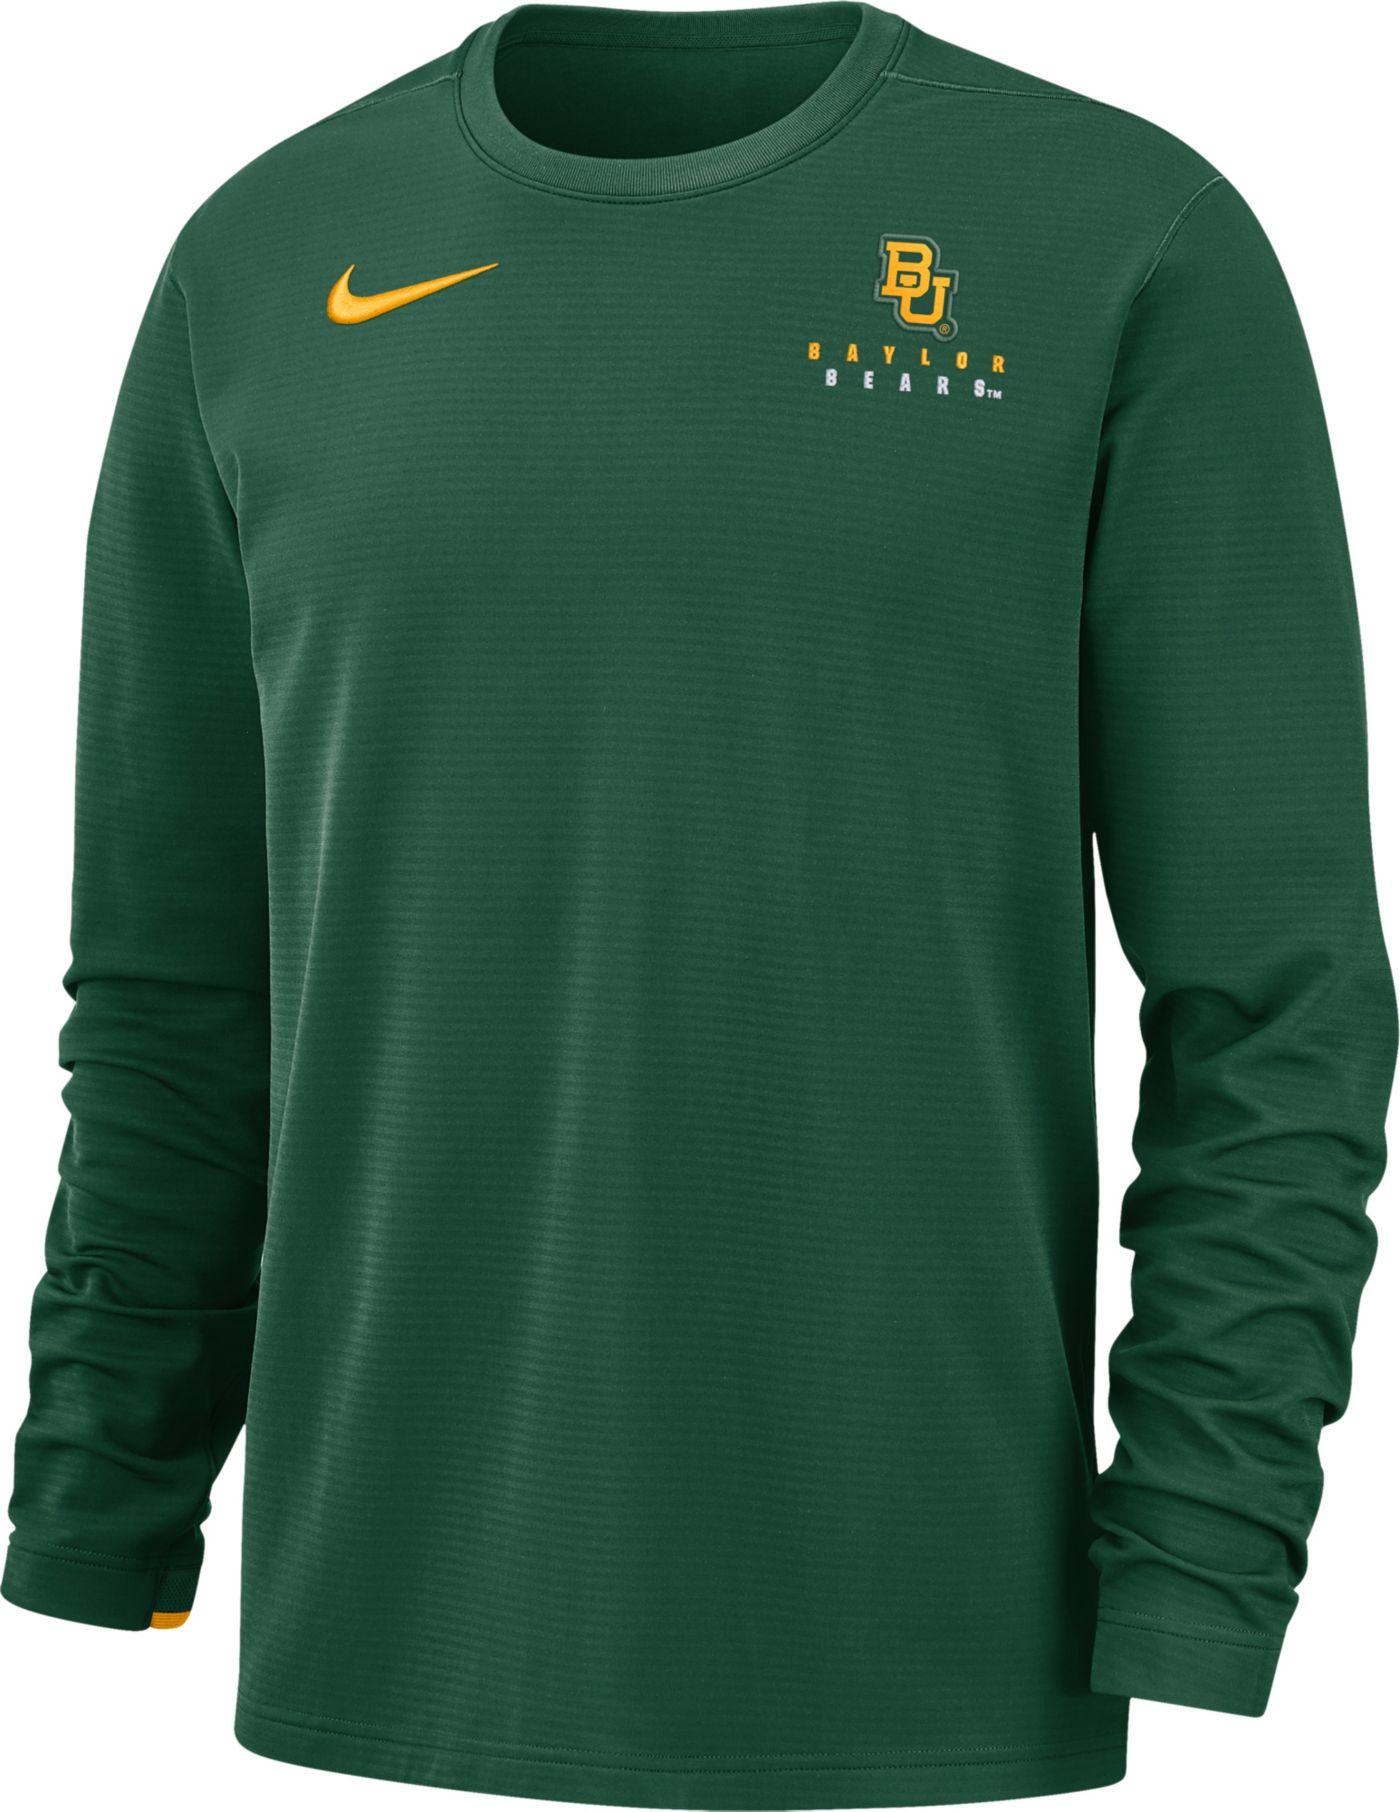 Nike Men's Baylor Bears Green Dri-FIT Modern Long Sleeve Crew Neck T-Shirt